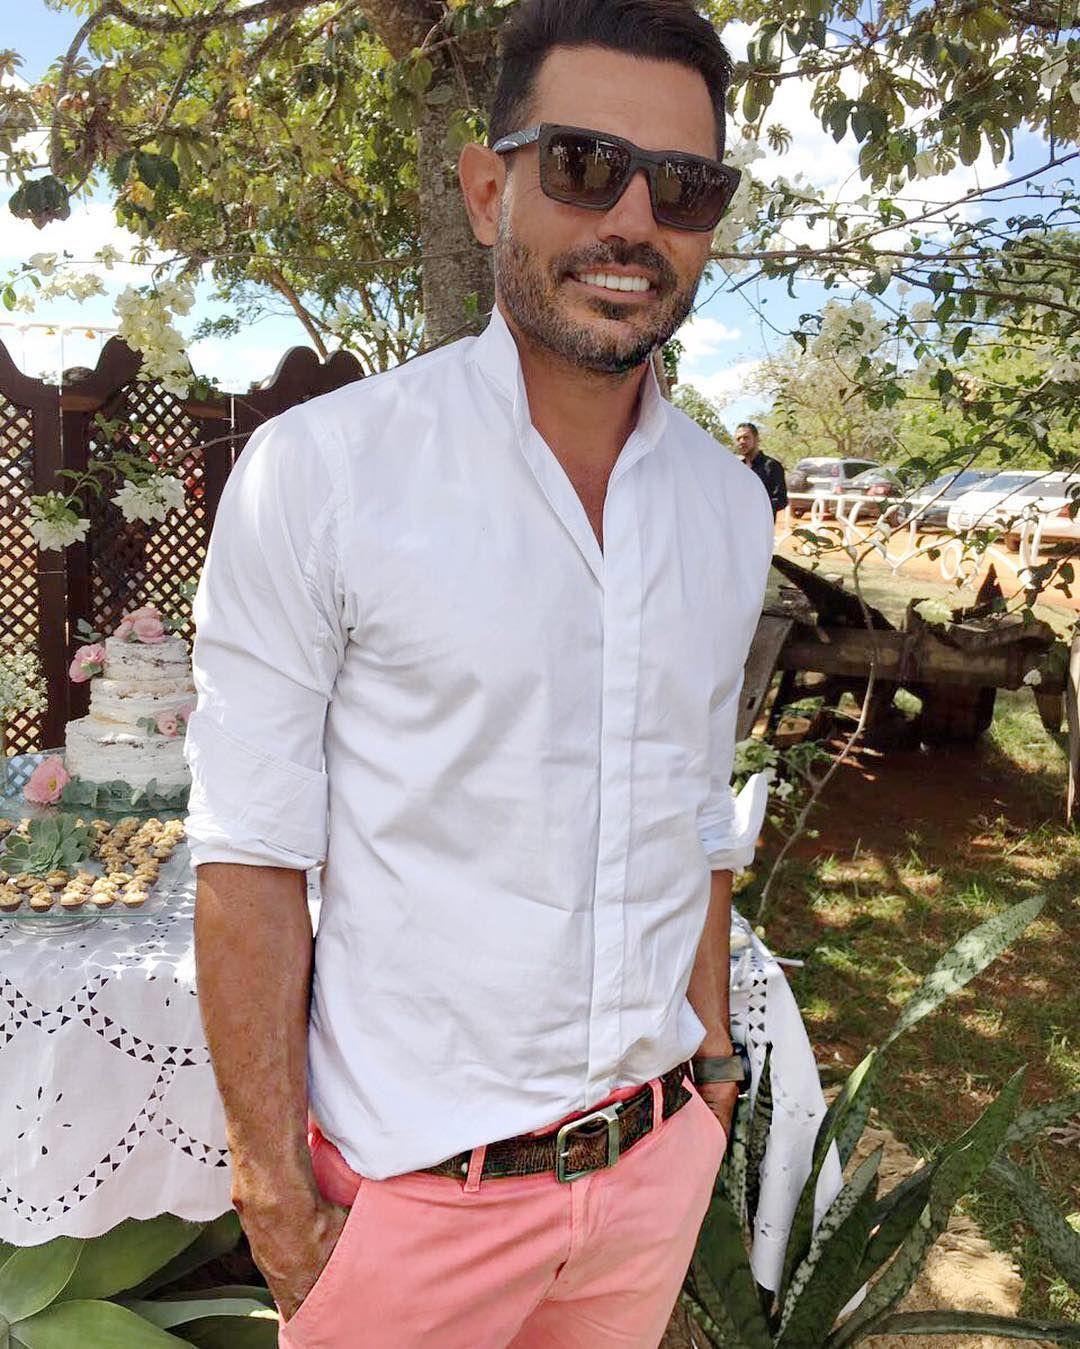 Um casamento cheio de amor despojado é bem humorado.#leonardocarvalhoalfaiataria #lcalfaiataria #modamasculina #ternos #ternoslim #alfaiataria #luxury #luxo #sobmedida #style #suit #suits #gravatas #casamentos #noivos #executivos #empresarios #formen #menstyle #menswear #mensfashion #consultordeimagem #lifestyle #roupasparahomens #fashionformen #personalstylist #welldressedman #leonardocarvalho  #minhacapital by lc_alfaiataria